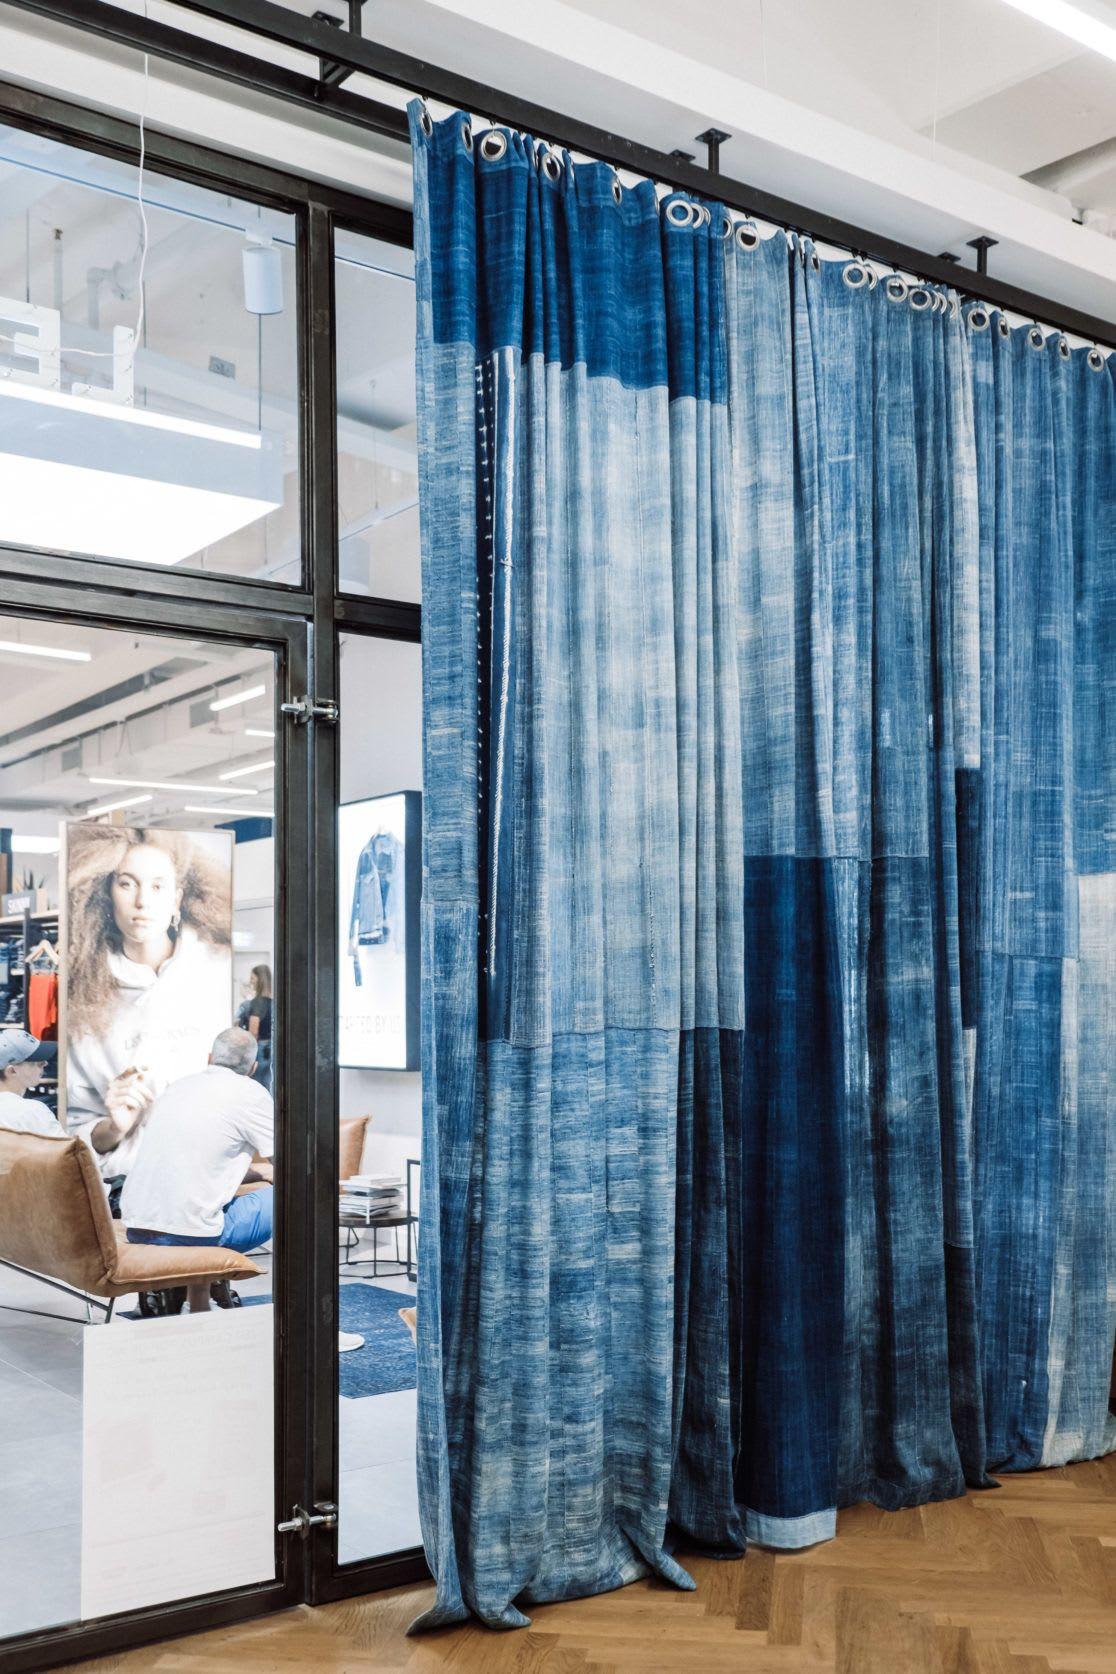 Curtains & Drapes by Blue Print Amsterdam seen at Levi's® Ehrenstraße, Köln - Indigo Patchwork Curtains